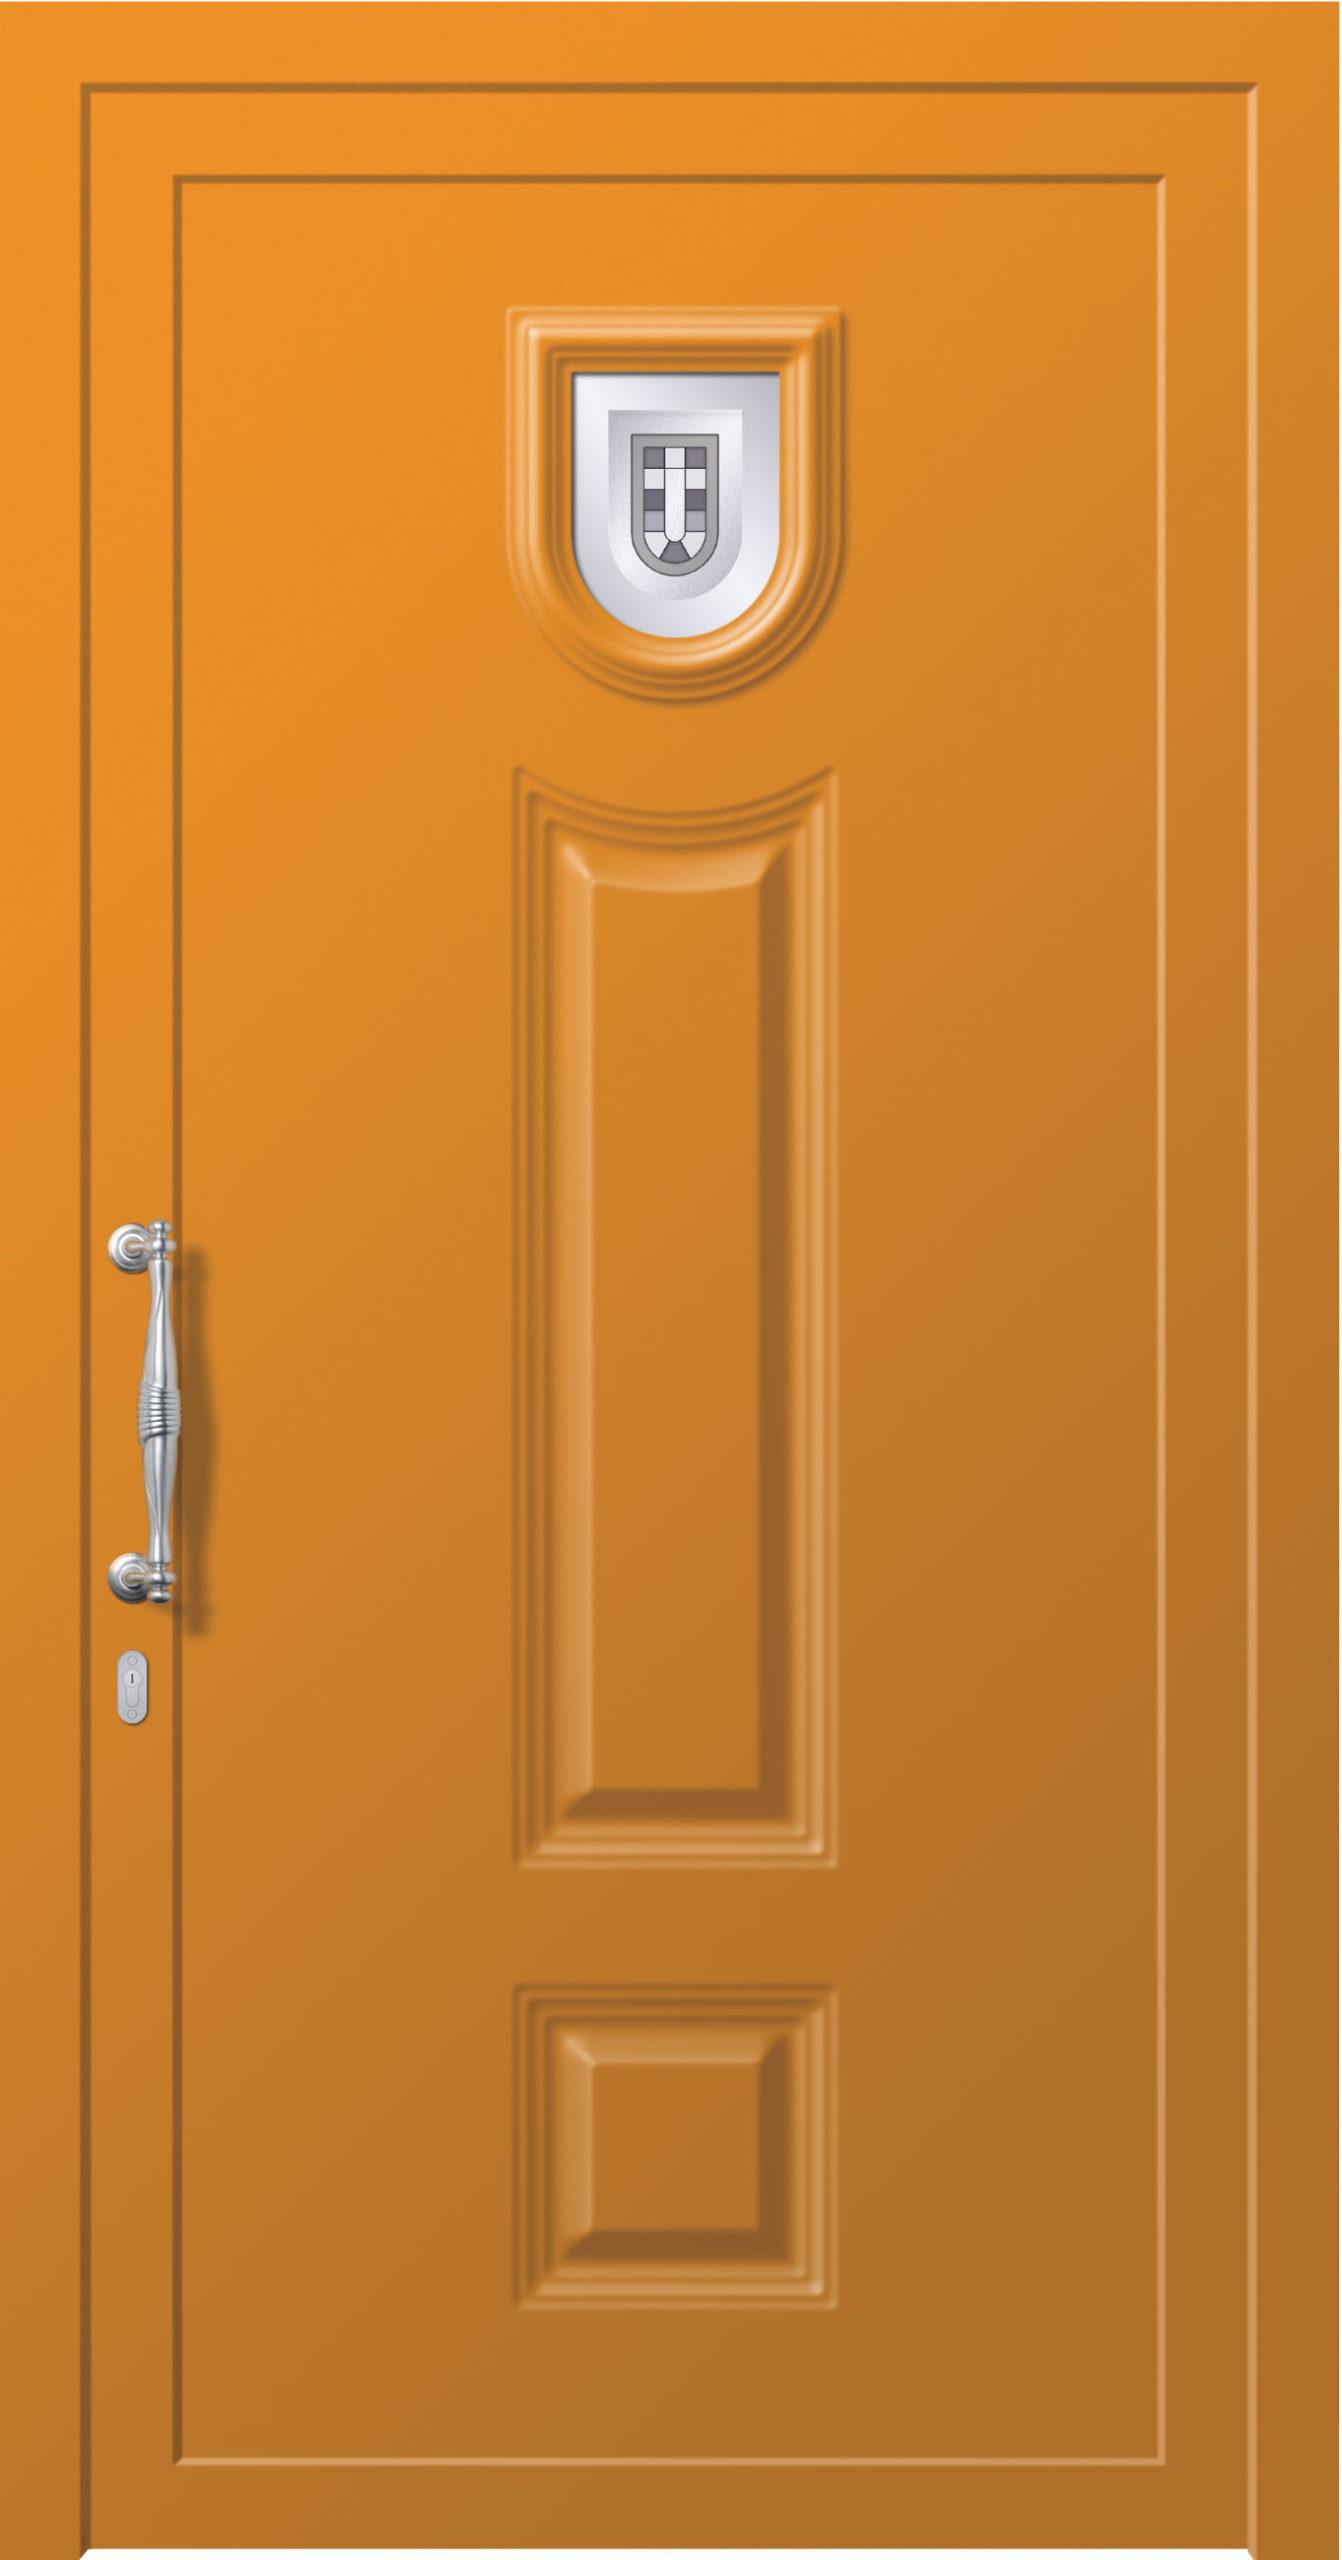 Entry Doors Linea Classica 72